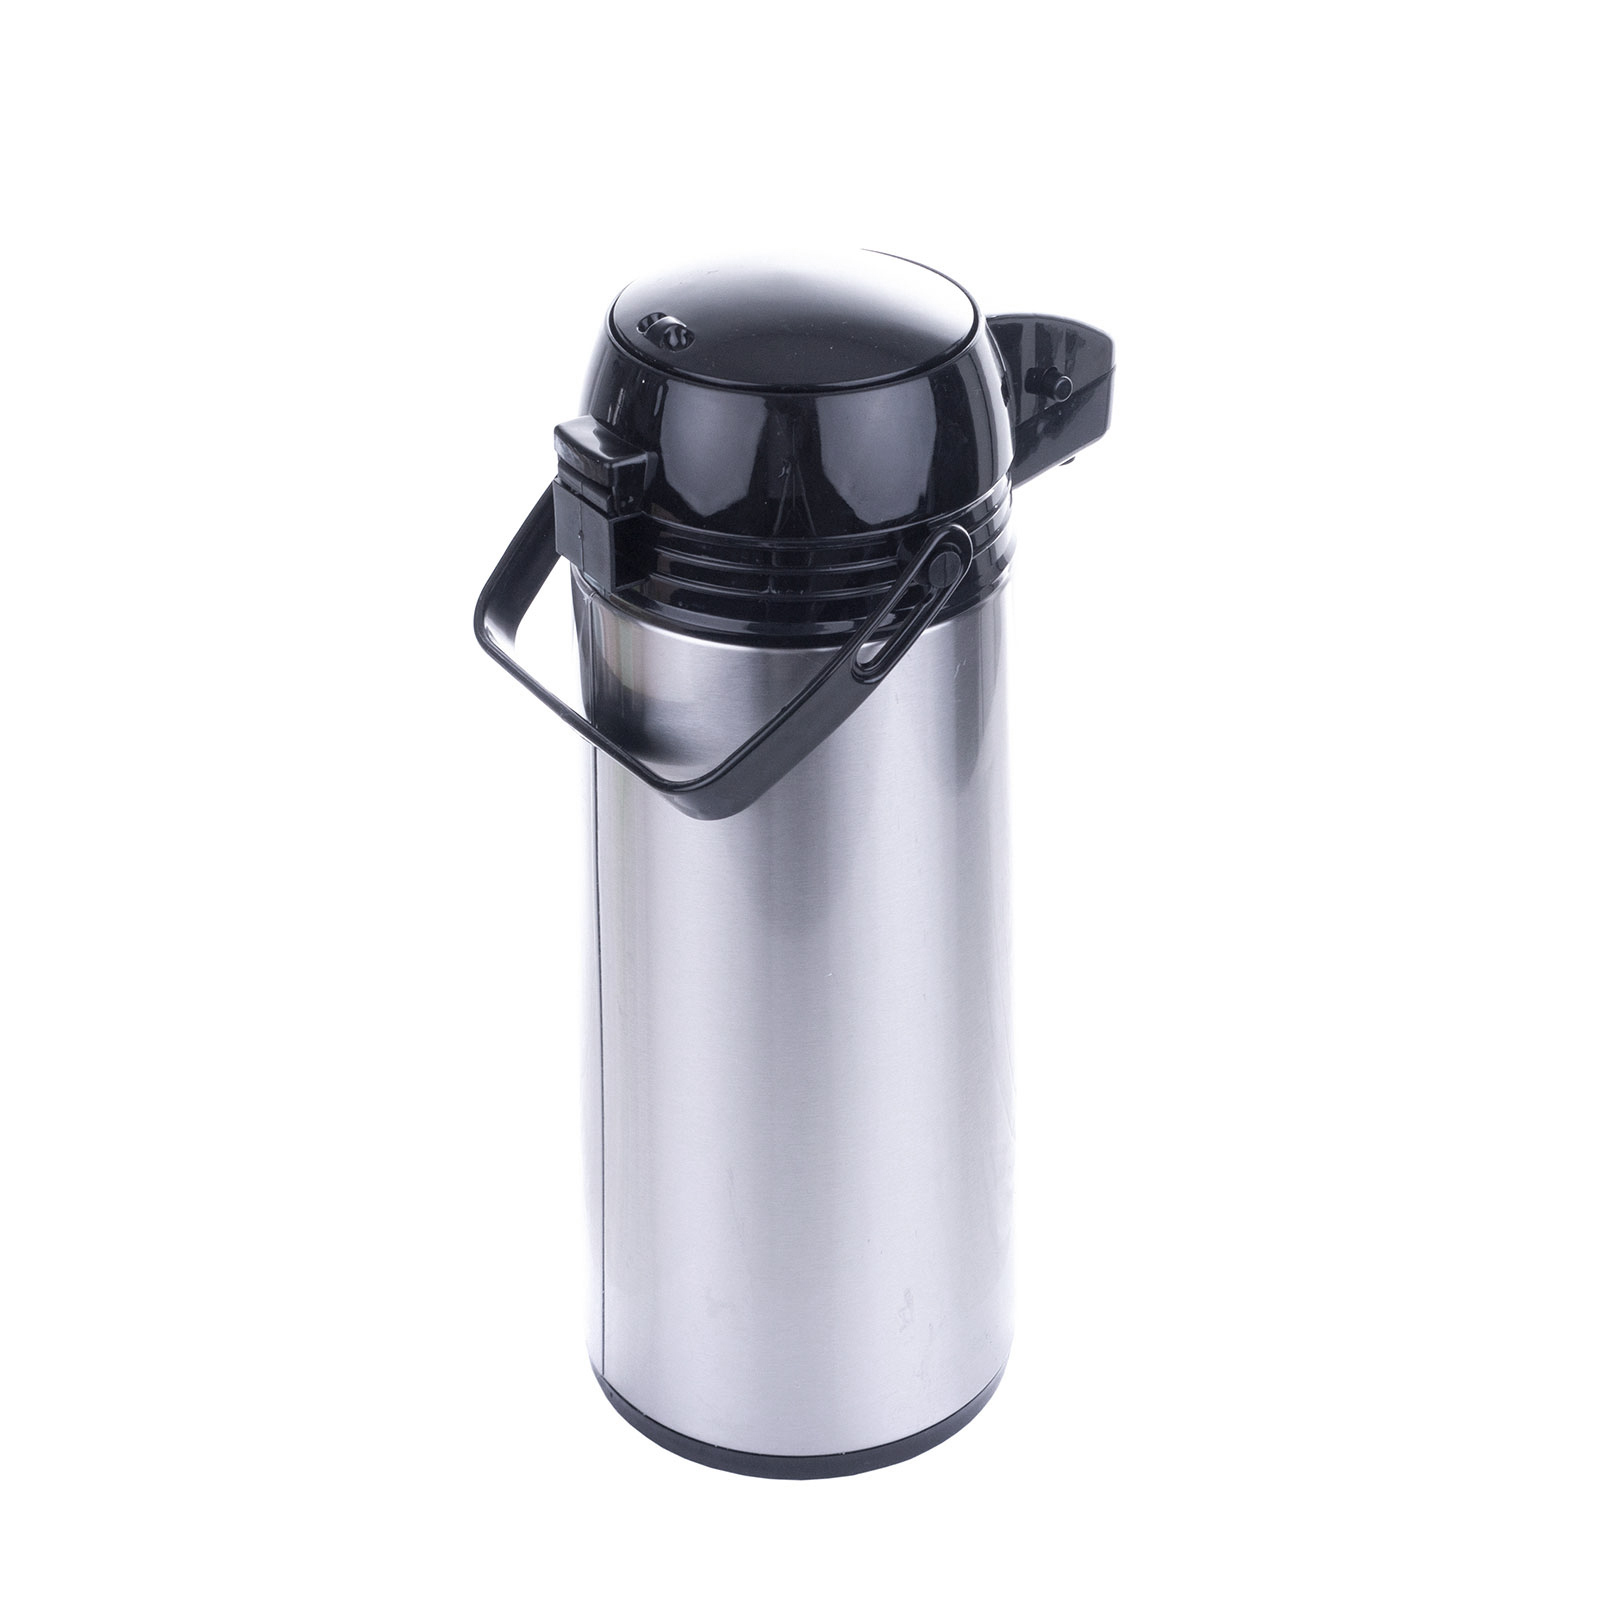 airpot 1 9 l pumpkanne isolierkanne thermo kanne kaffeekanne camping edelstahl ebay. Black Bedroom Furniture Sets. Home Design Ideas